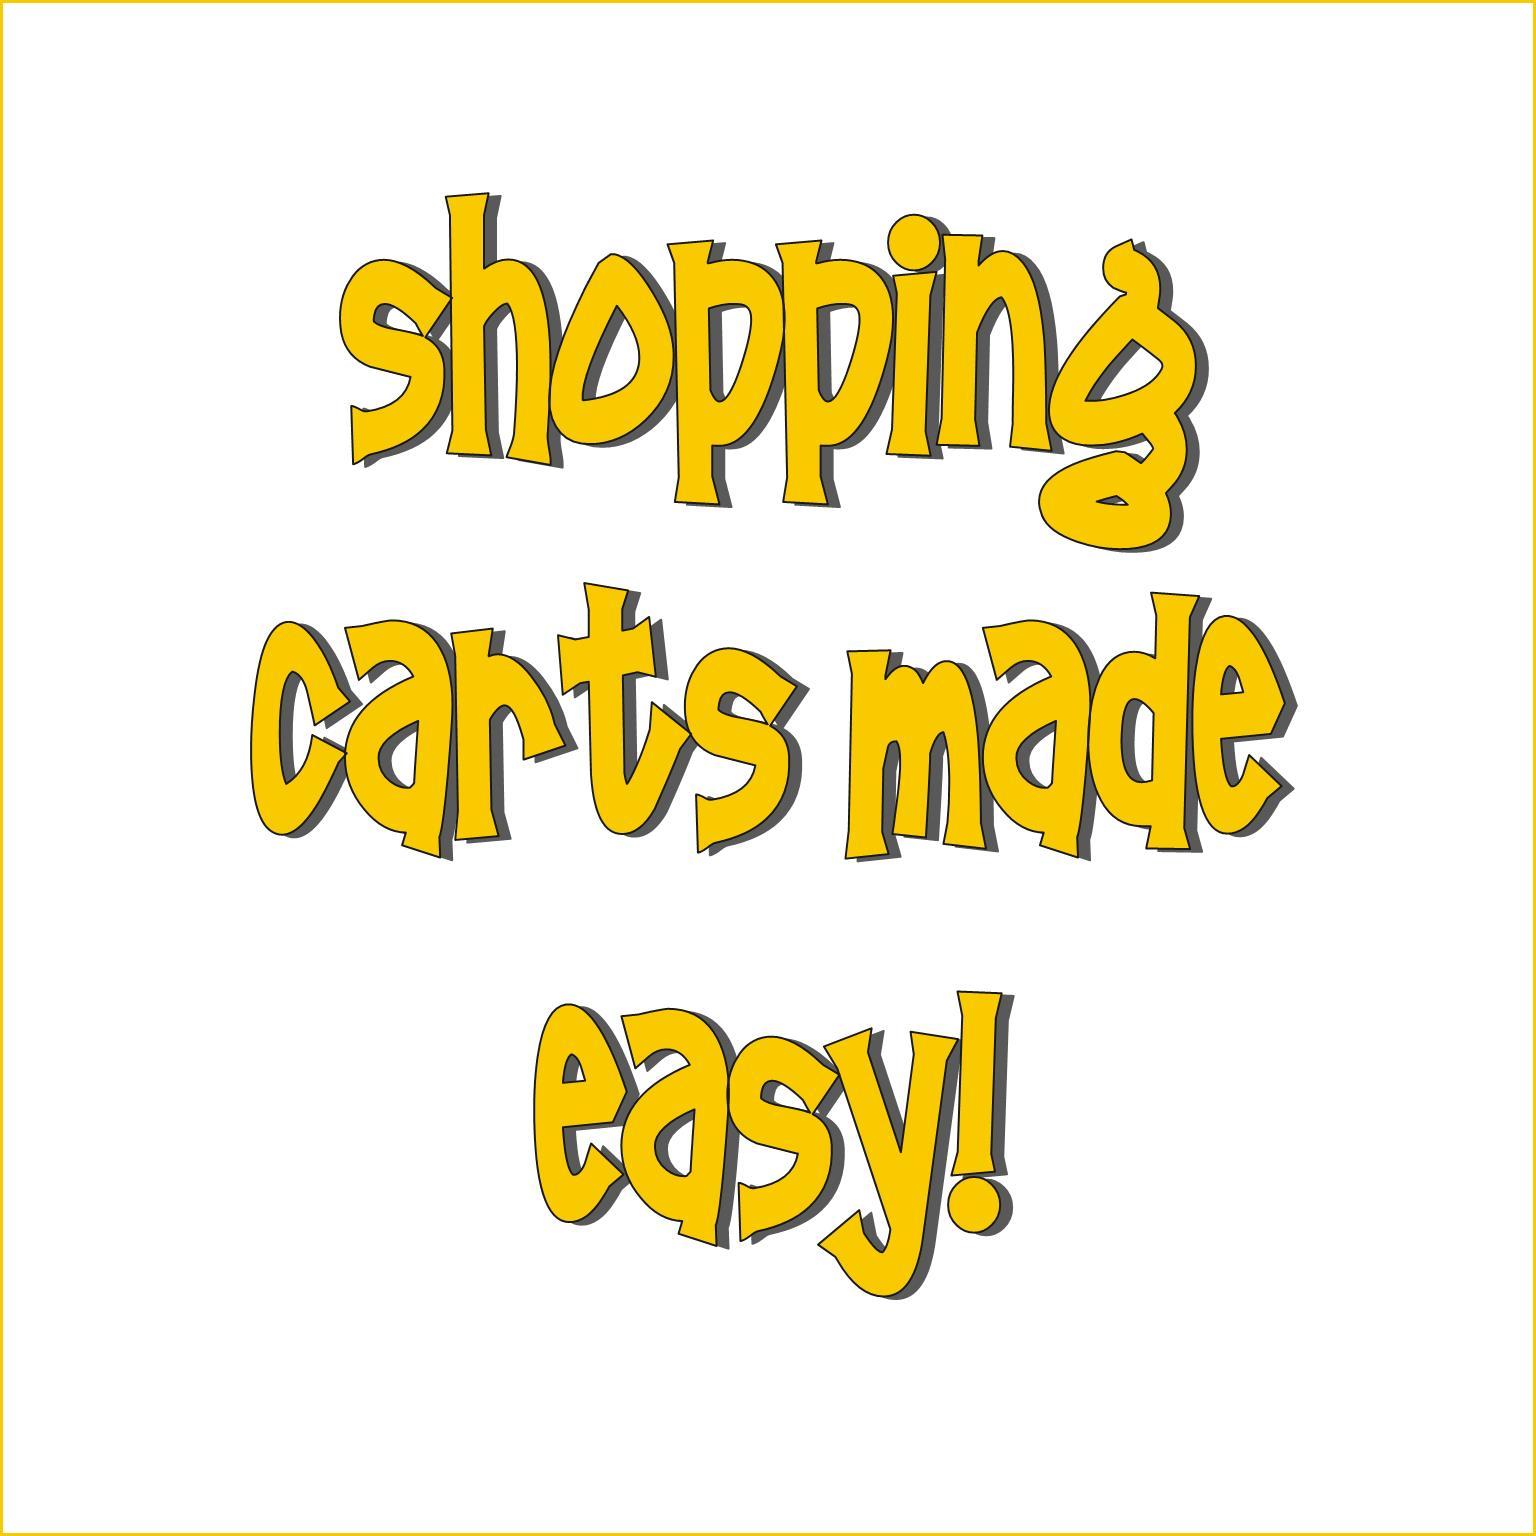 Shopping Carts Made Easy!